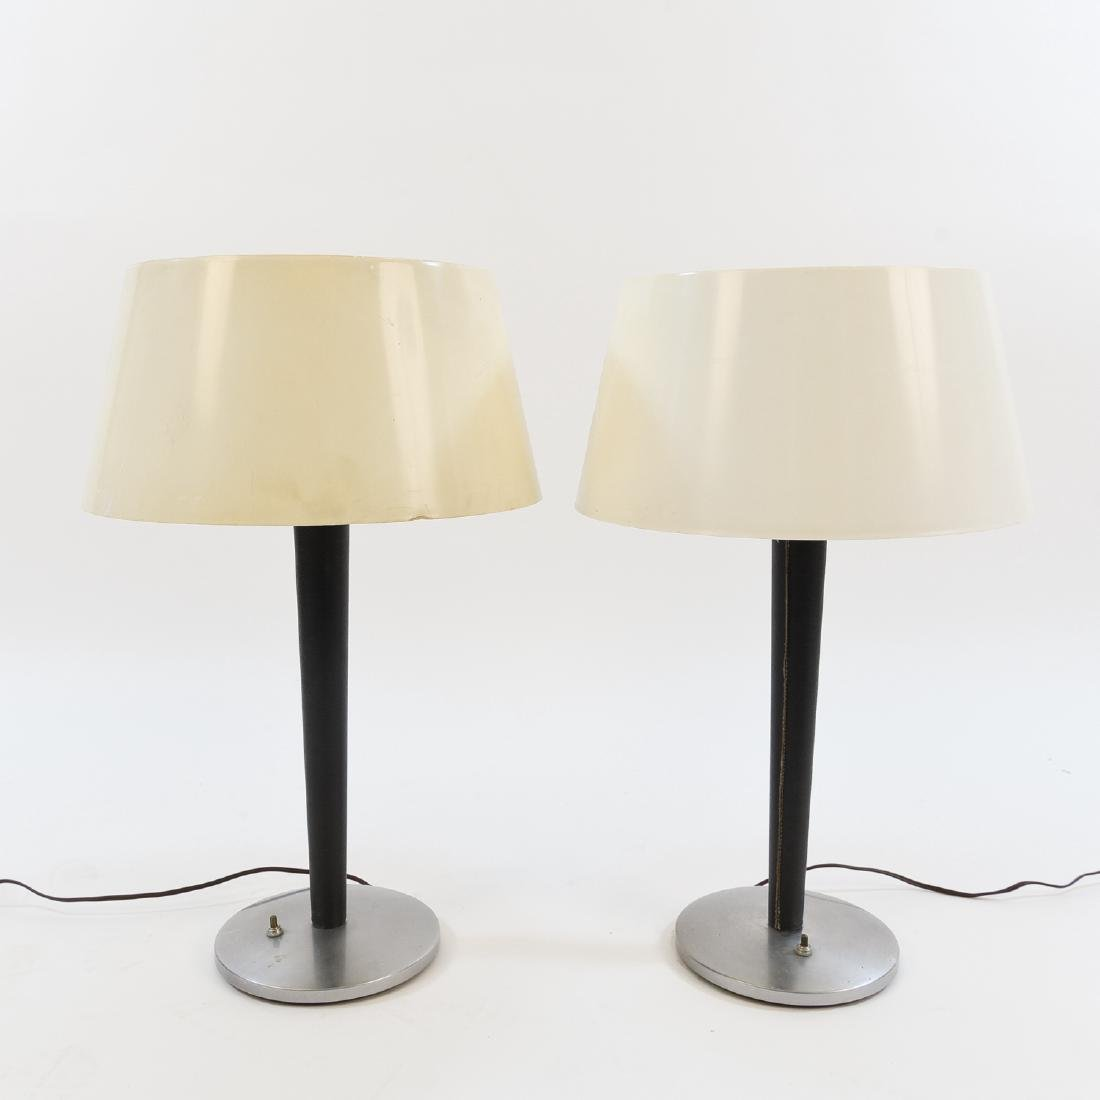 PAIR OF LIGHTOLIER GERALD THURSTON TABLE LAMPS